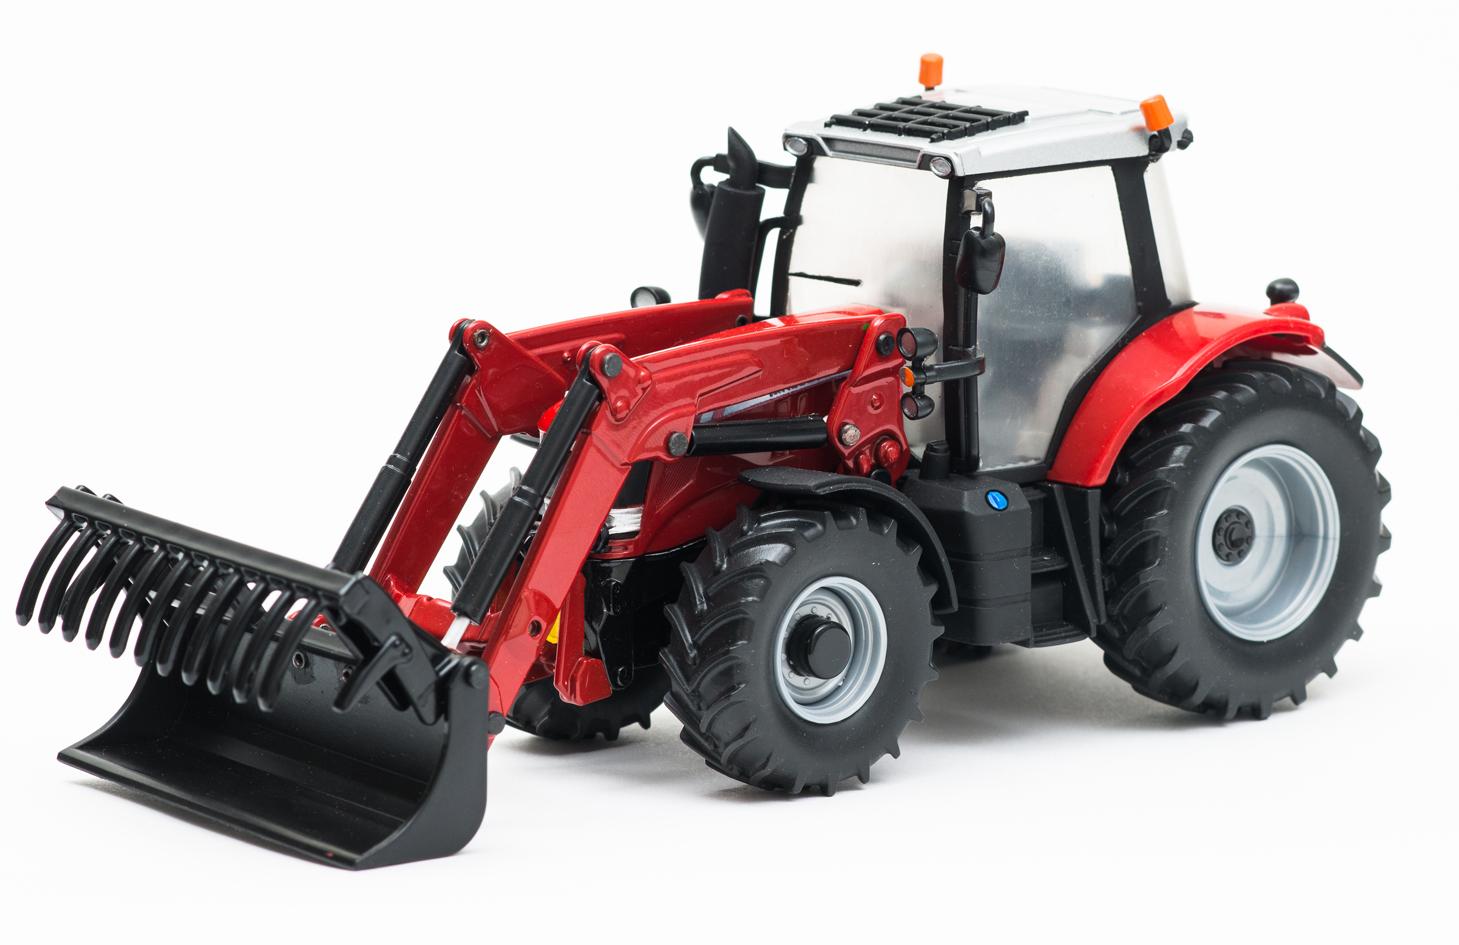 Massey Ferguson Tractor Loader Backhoe : Britains a massey ferguson tractor with front